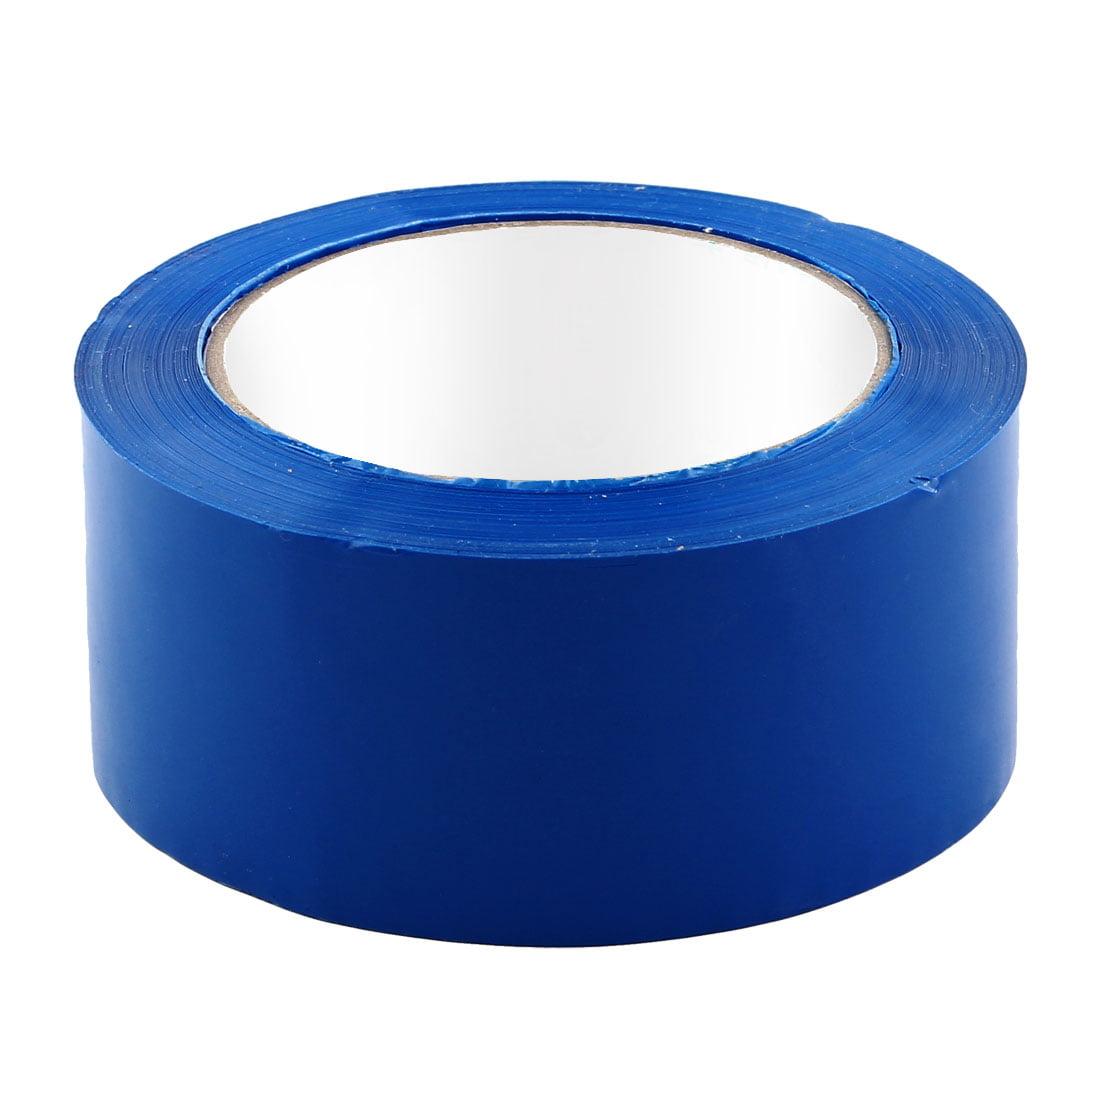 Shipping PVC Box Sealing Adhesive Tape Dark Blue 1.9'' x 98.4 Yards(295.3 Ft)